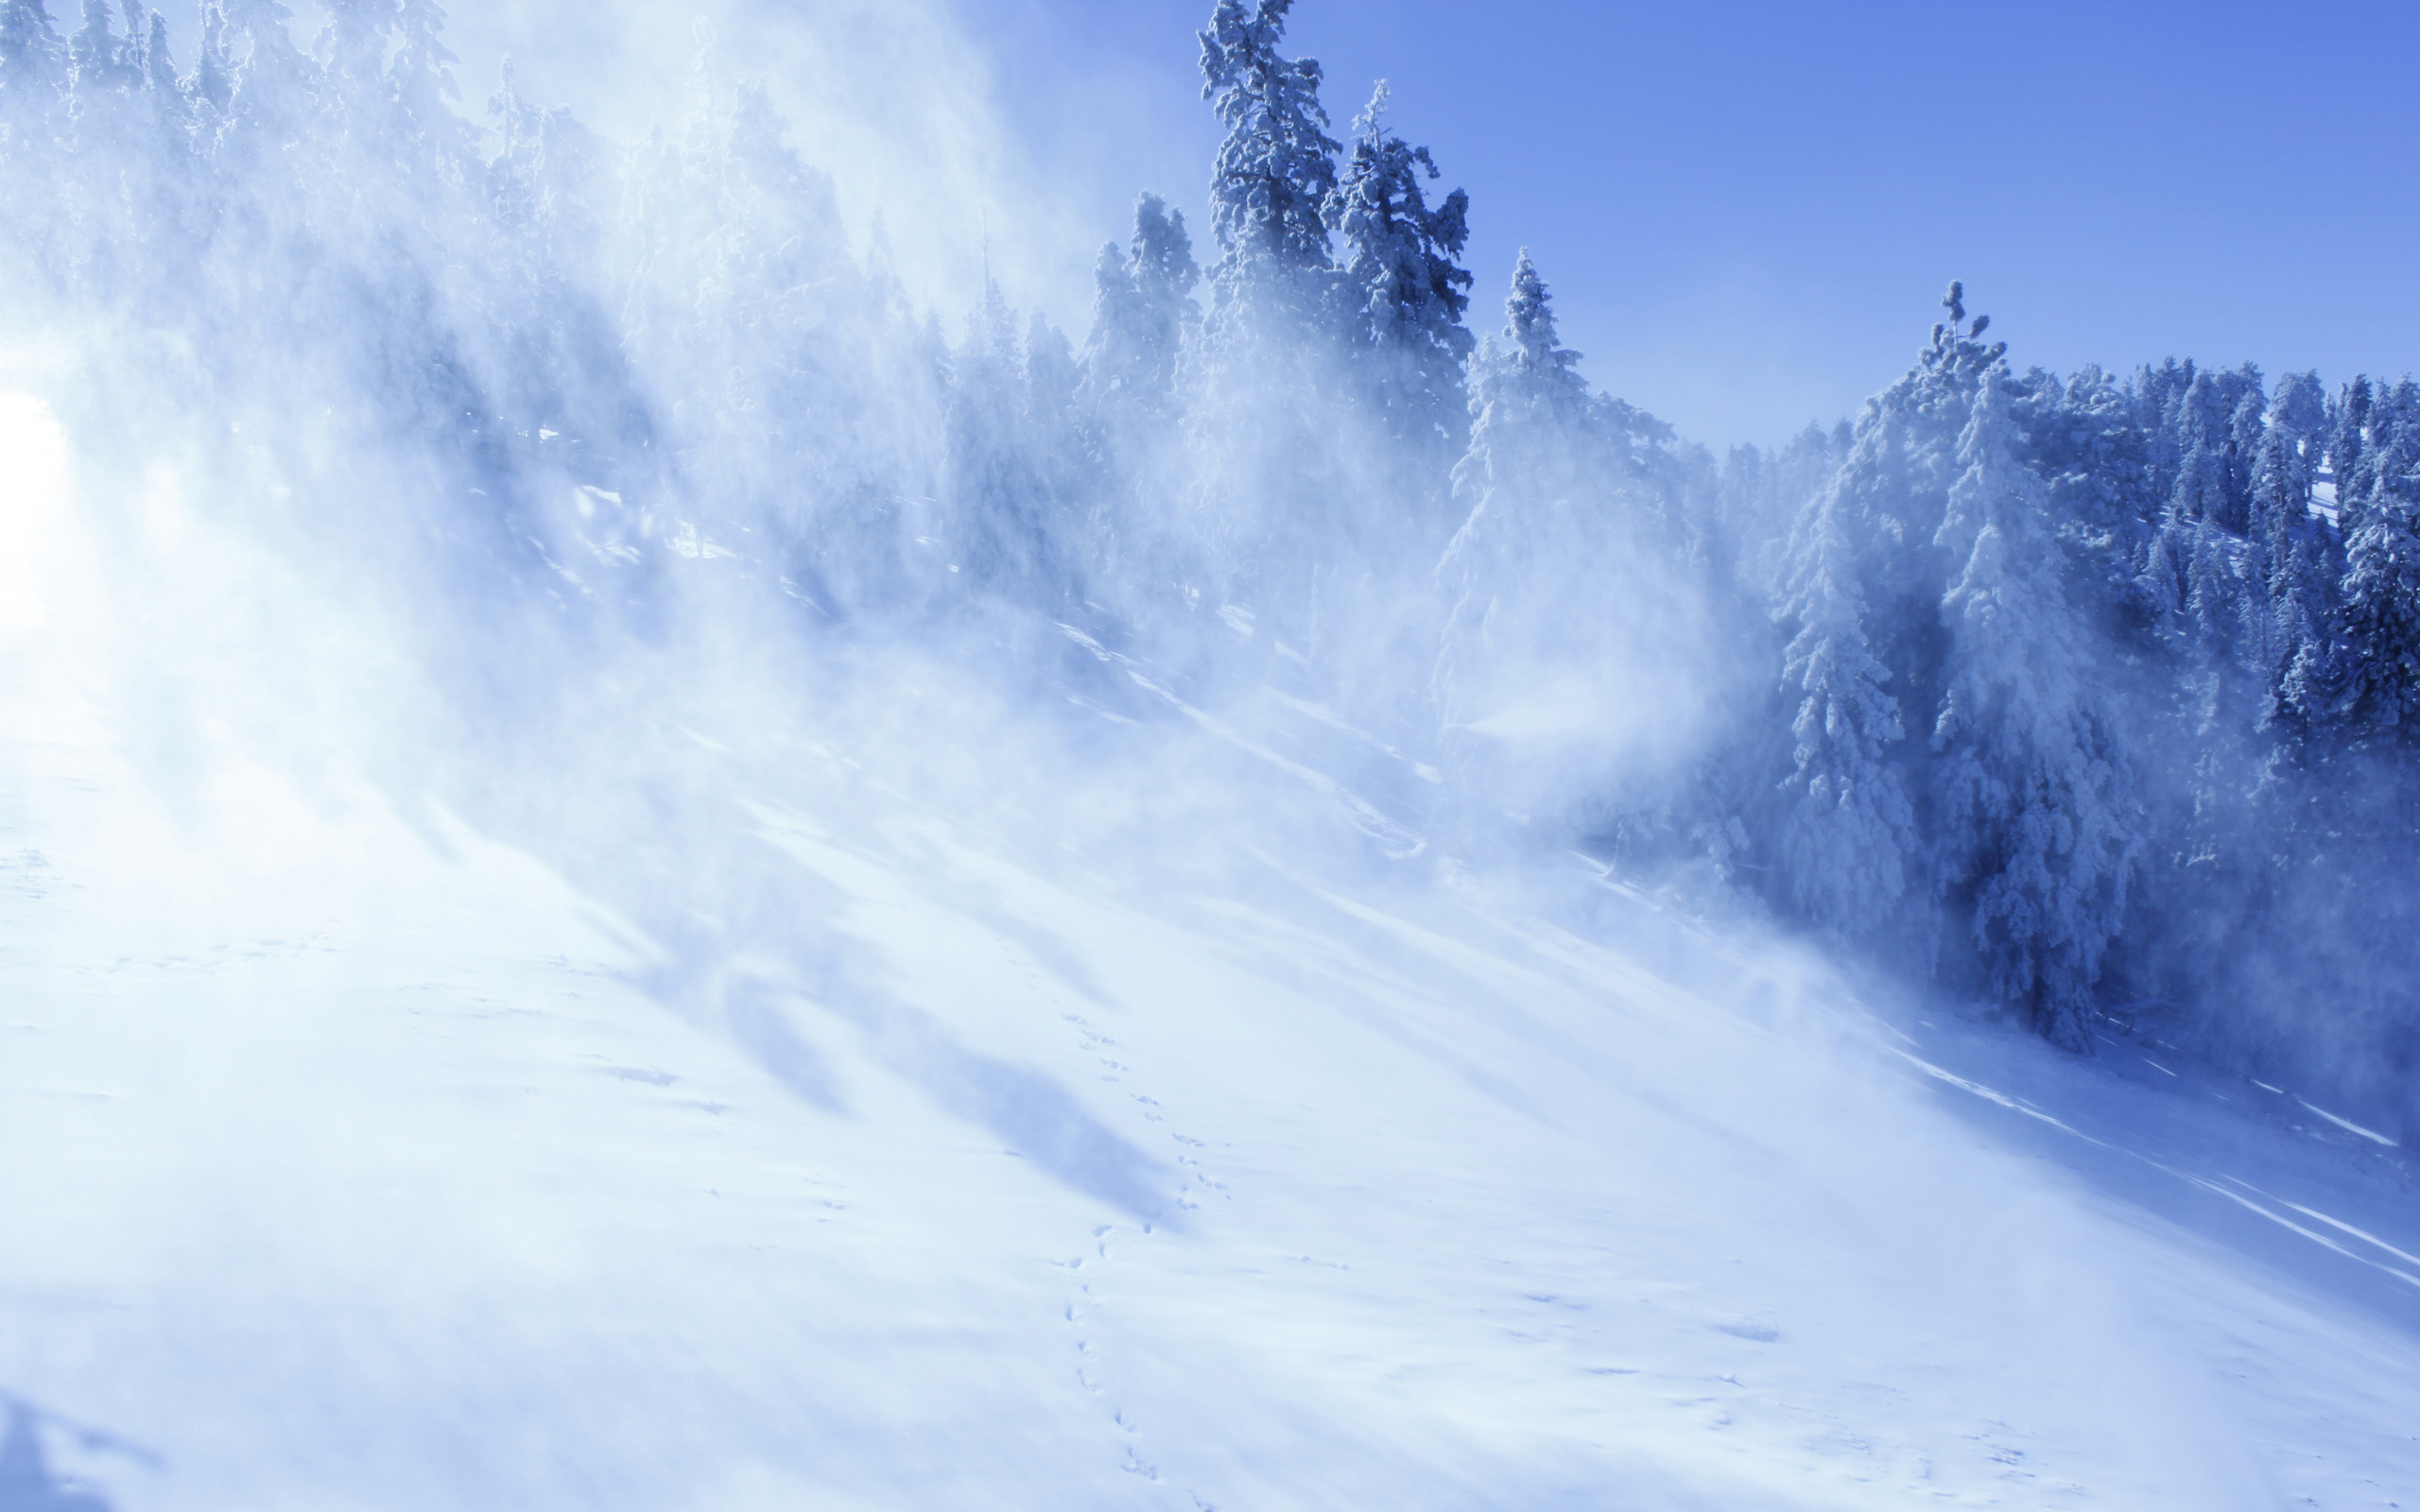 Avalanche Wallpaper